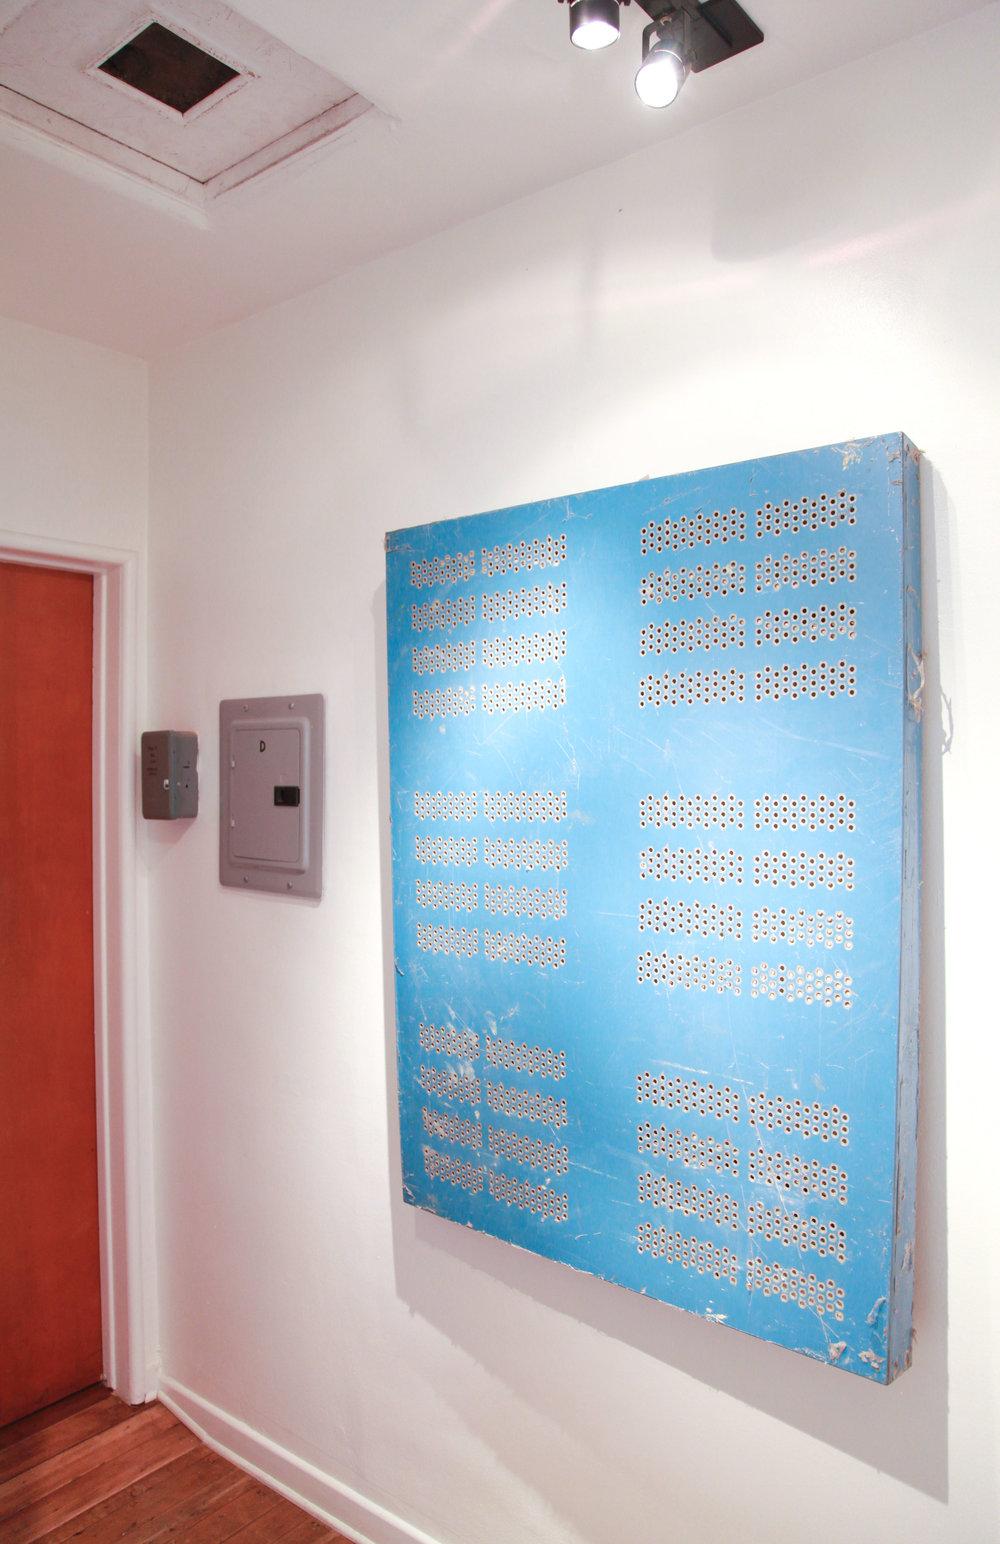 Installation view: Wolfgang Breuer